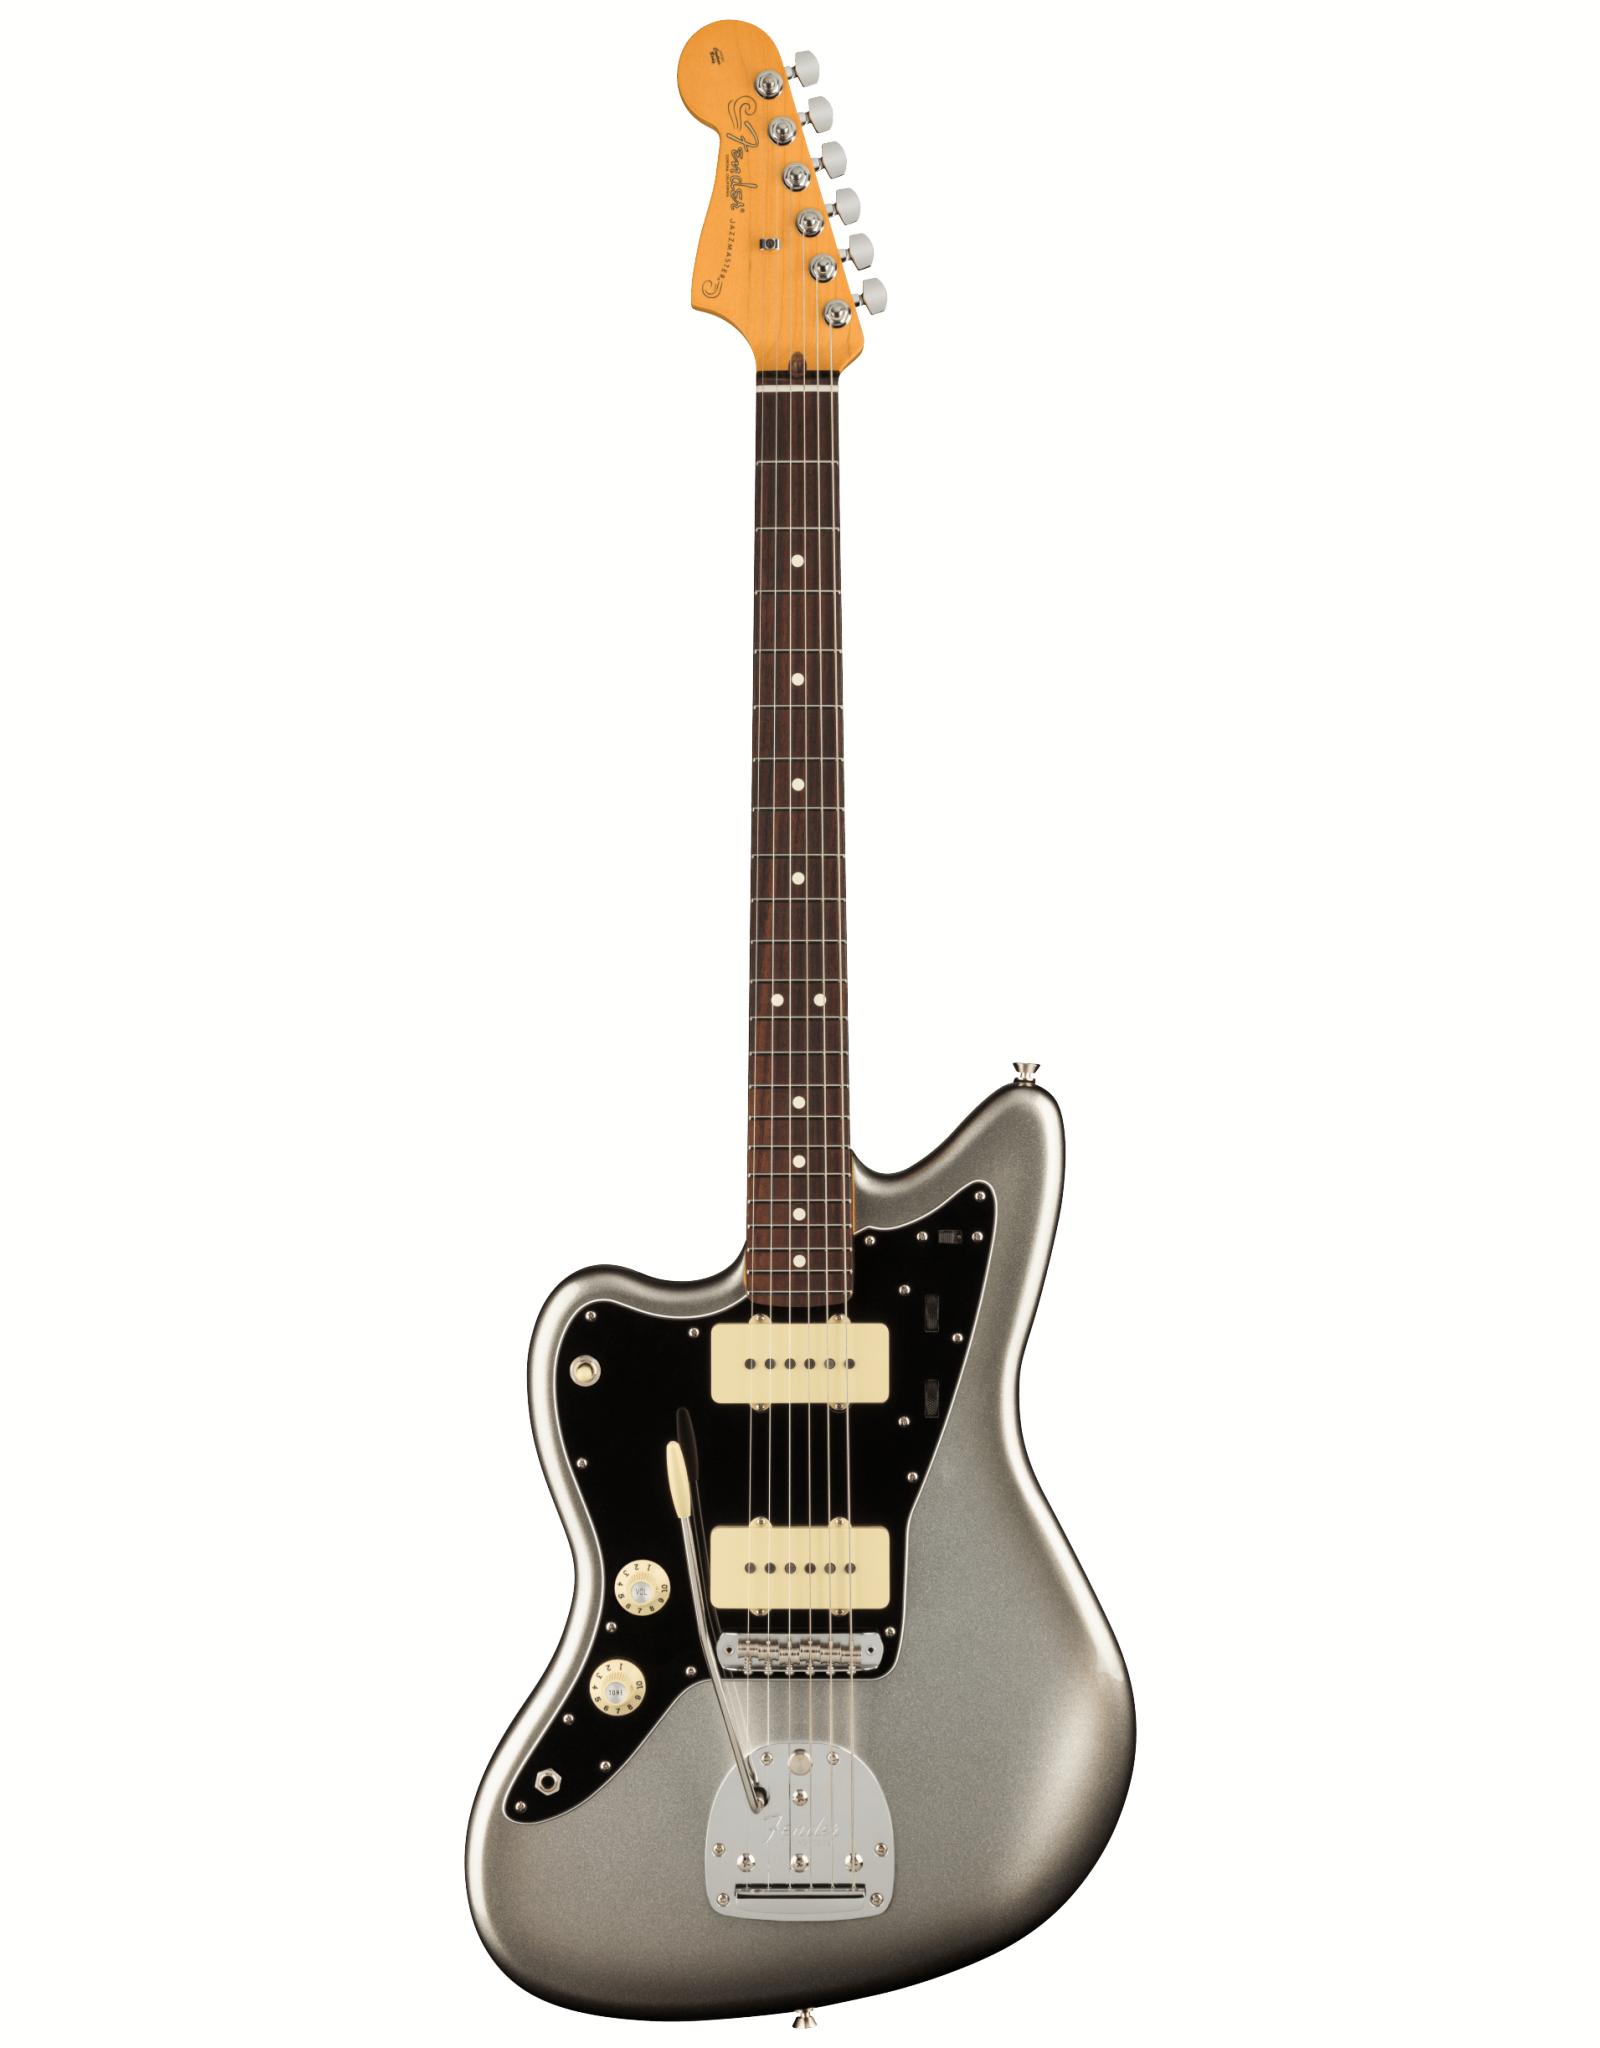 Fender Fender American Professional II Jazzmaster Left-Hand, Rosewood Fingerboard, Mercury w/ Deluxe Molded Case